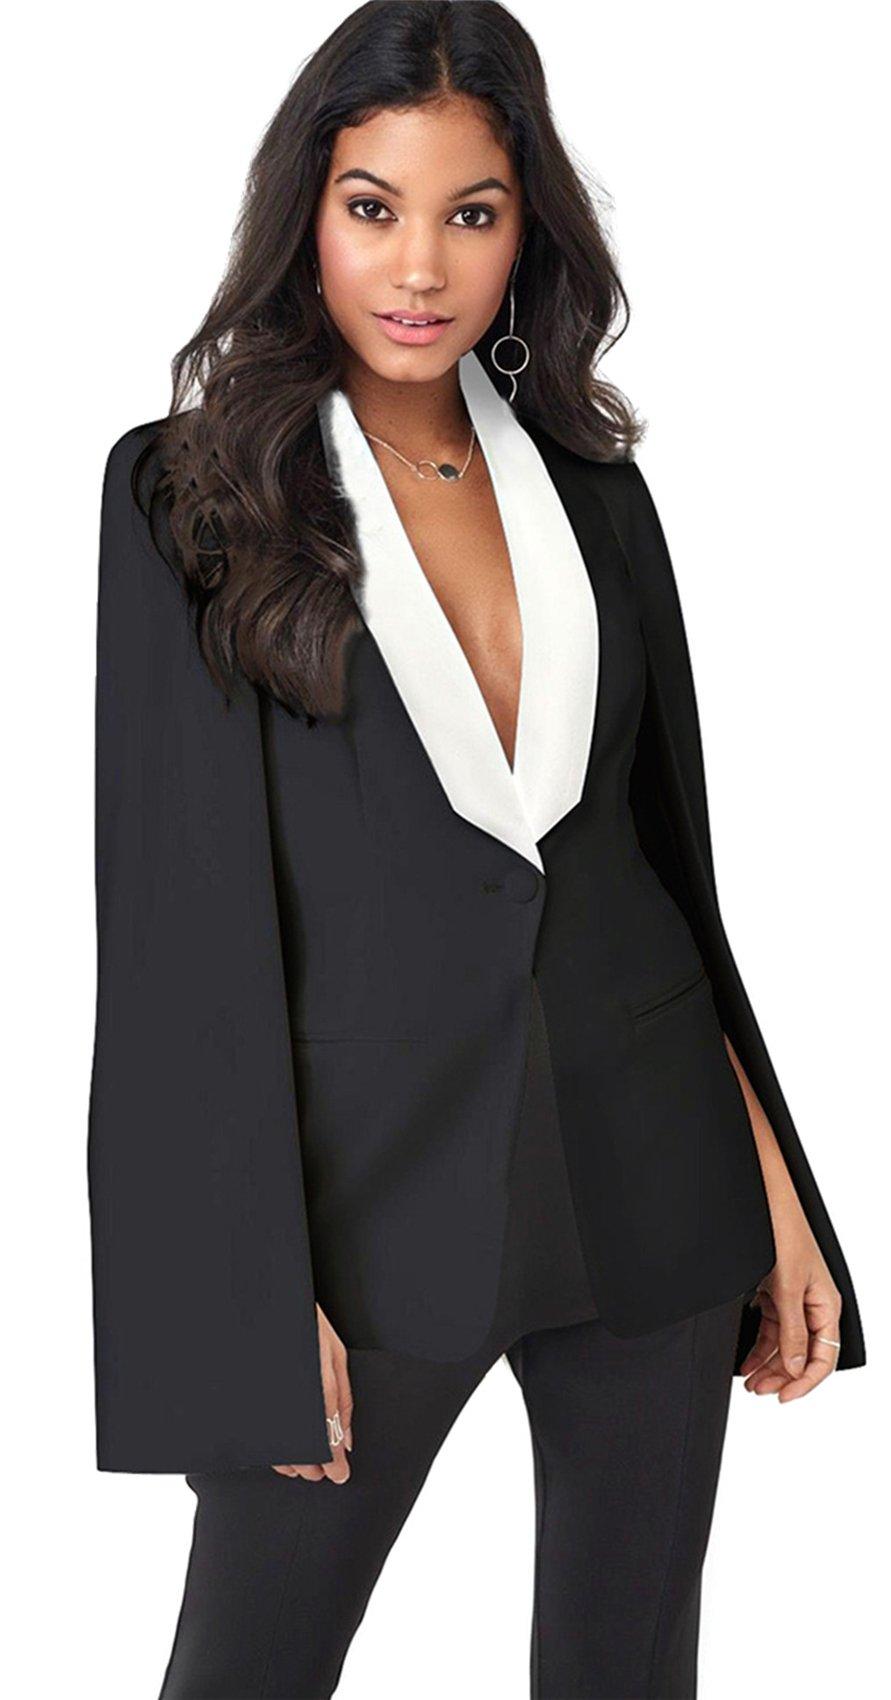 Cloak Poncho Cape Style Split Slit Long Sleeve Deep V Neck One Button Pocket Colorblock Blazer Jacket Top Black L